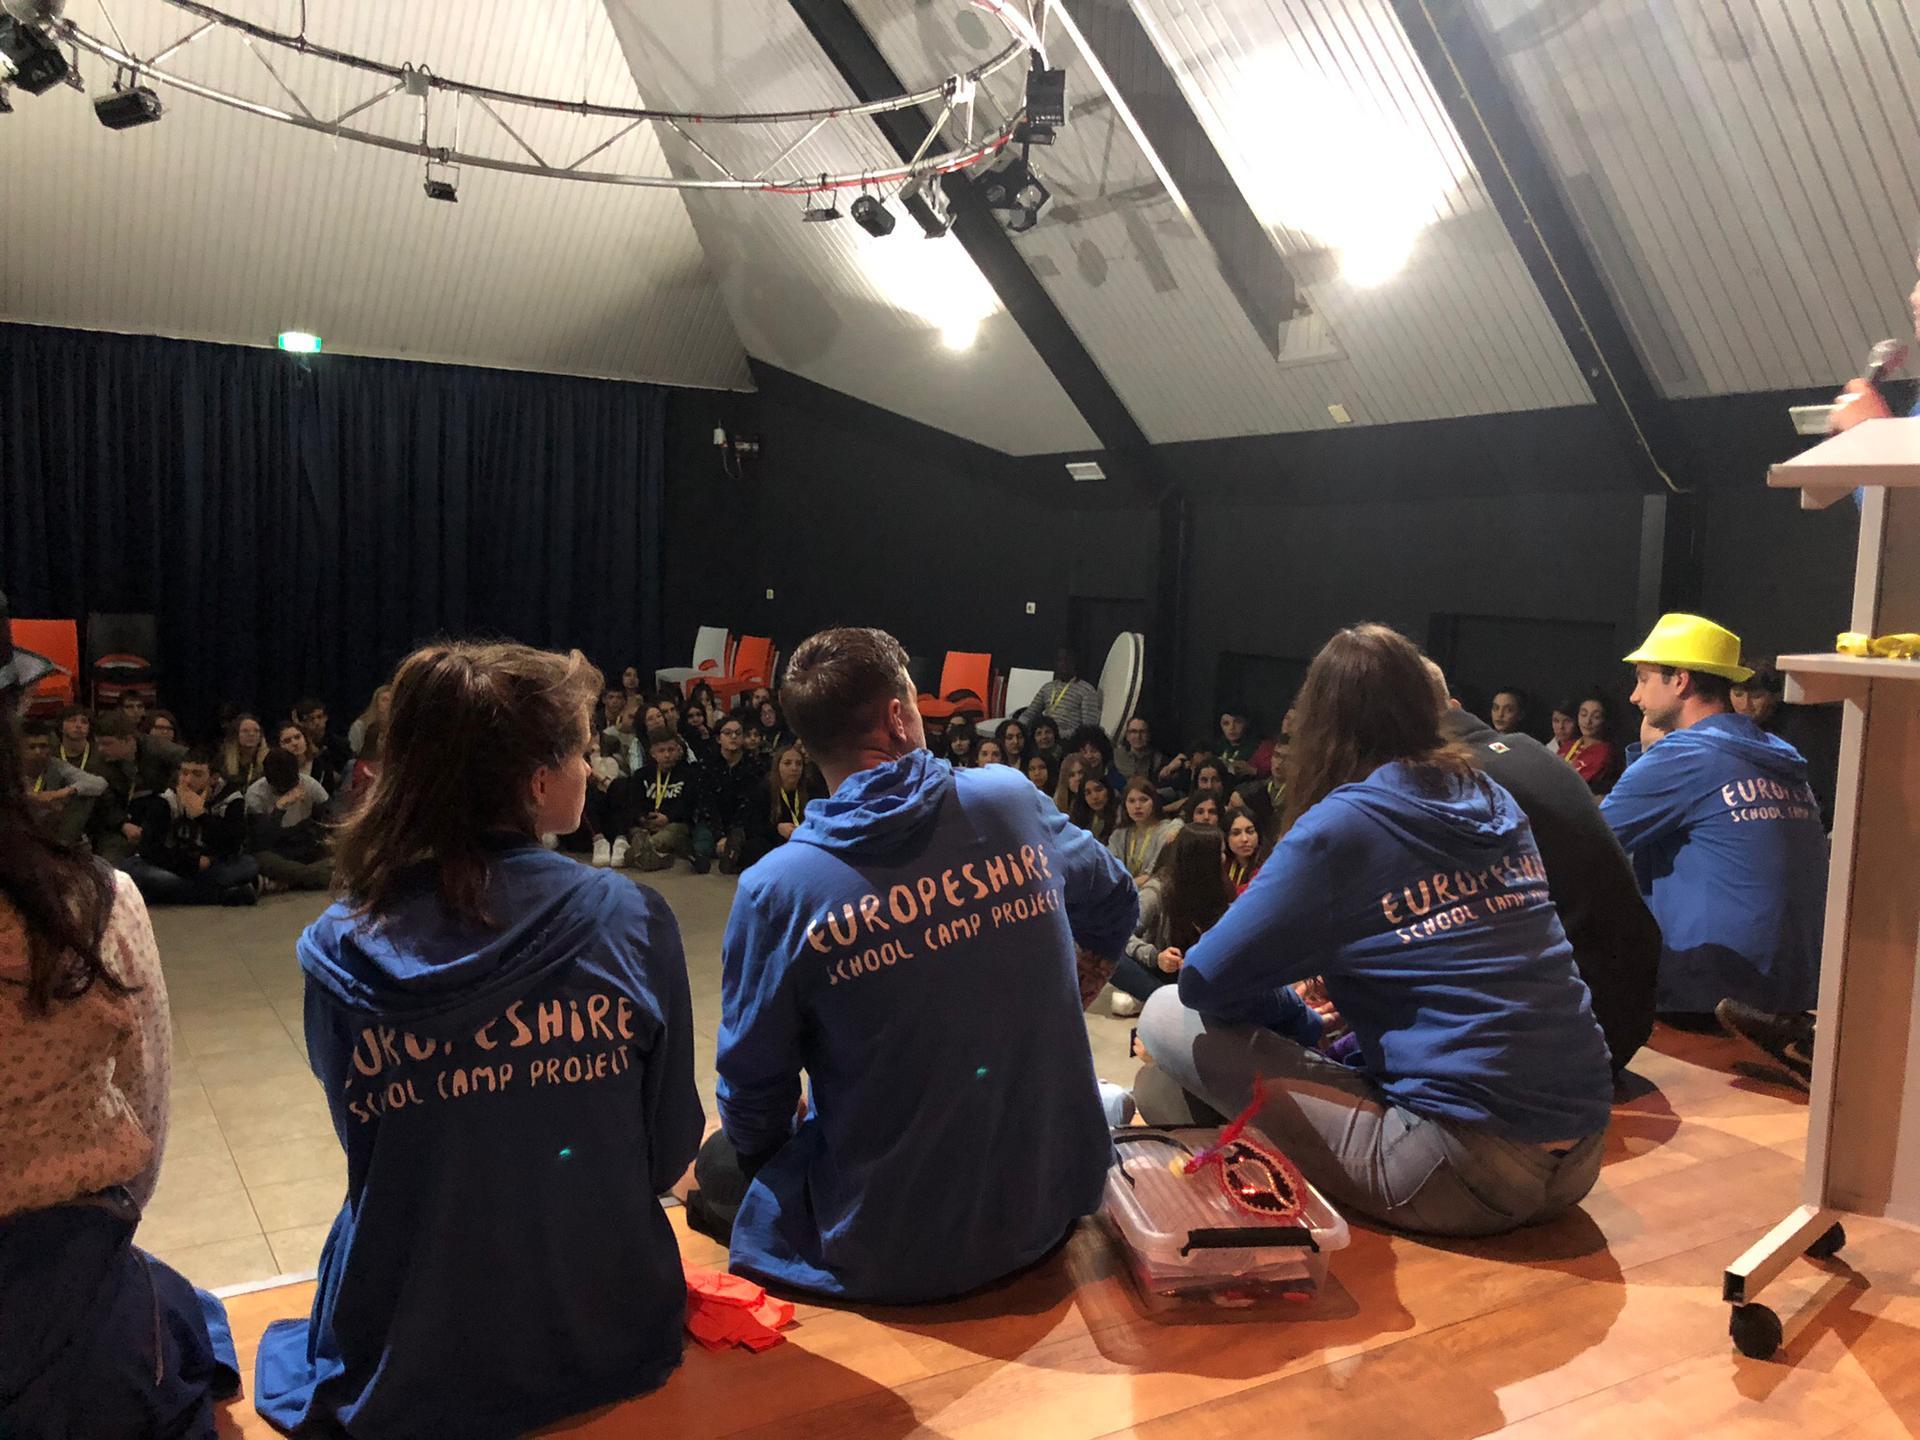 Students at EuropeShire